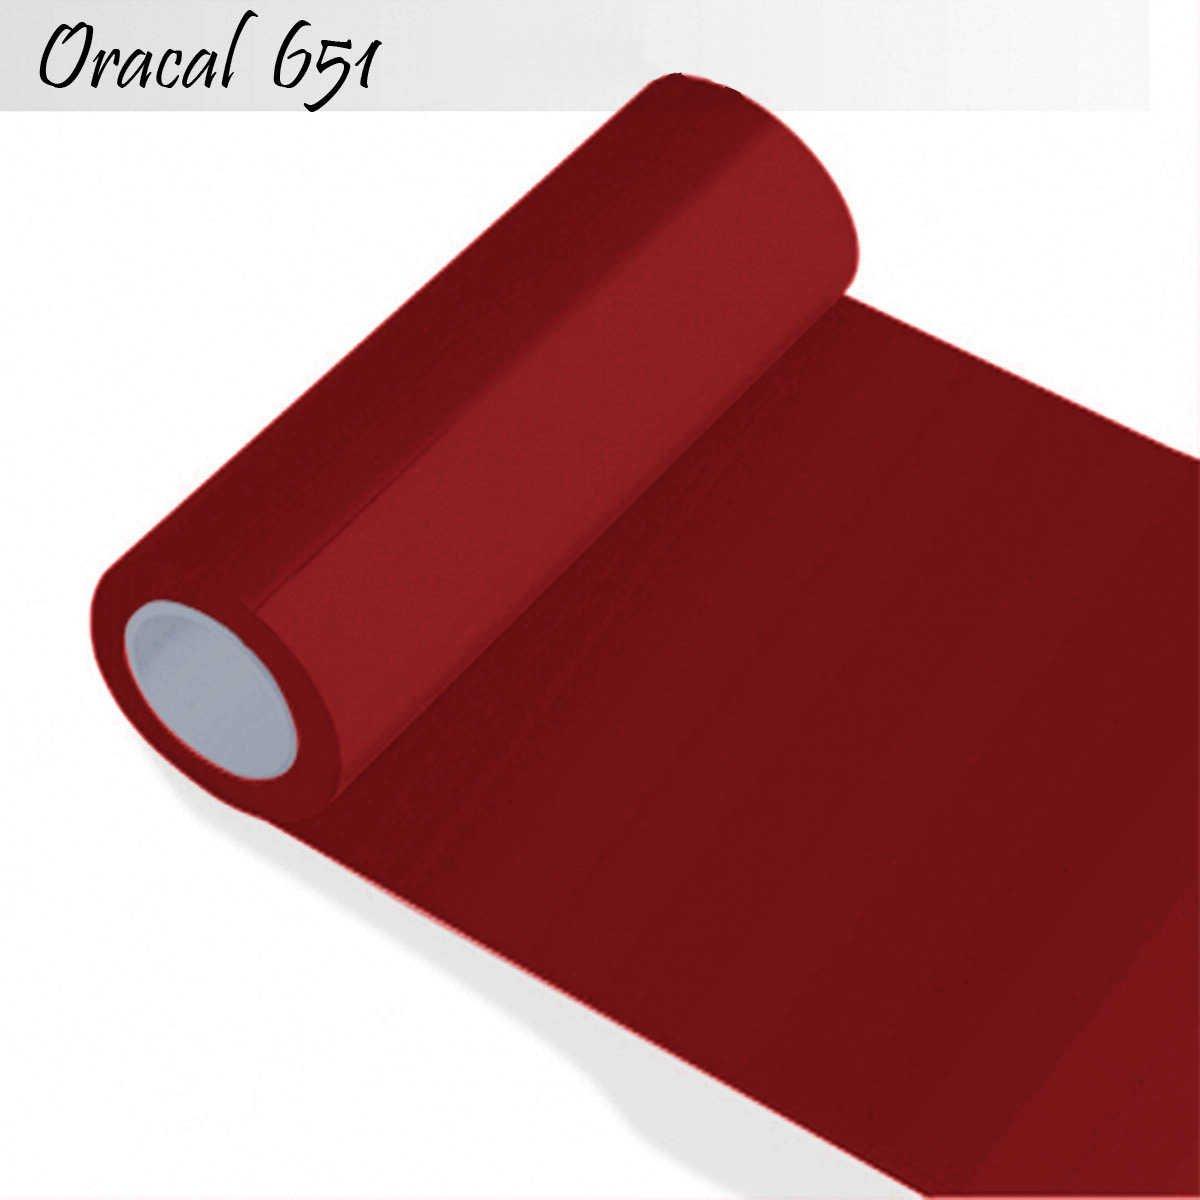 Oracal 651 - Orafol Folie 10m (Laufmeter) freie Farbwahl 55 55 55 glänzende Farben - glanz in 4 Größen, 63 cm Folienhöhe - Farbe 70 - schwarz B00TRTK15E Wandtattoos & Wandbilder bb5b62